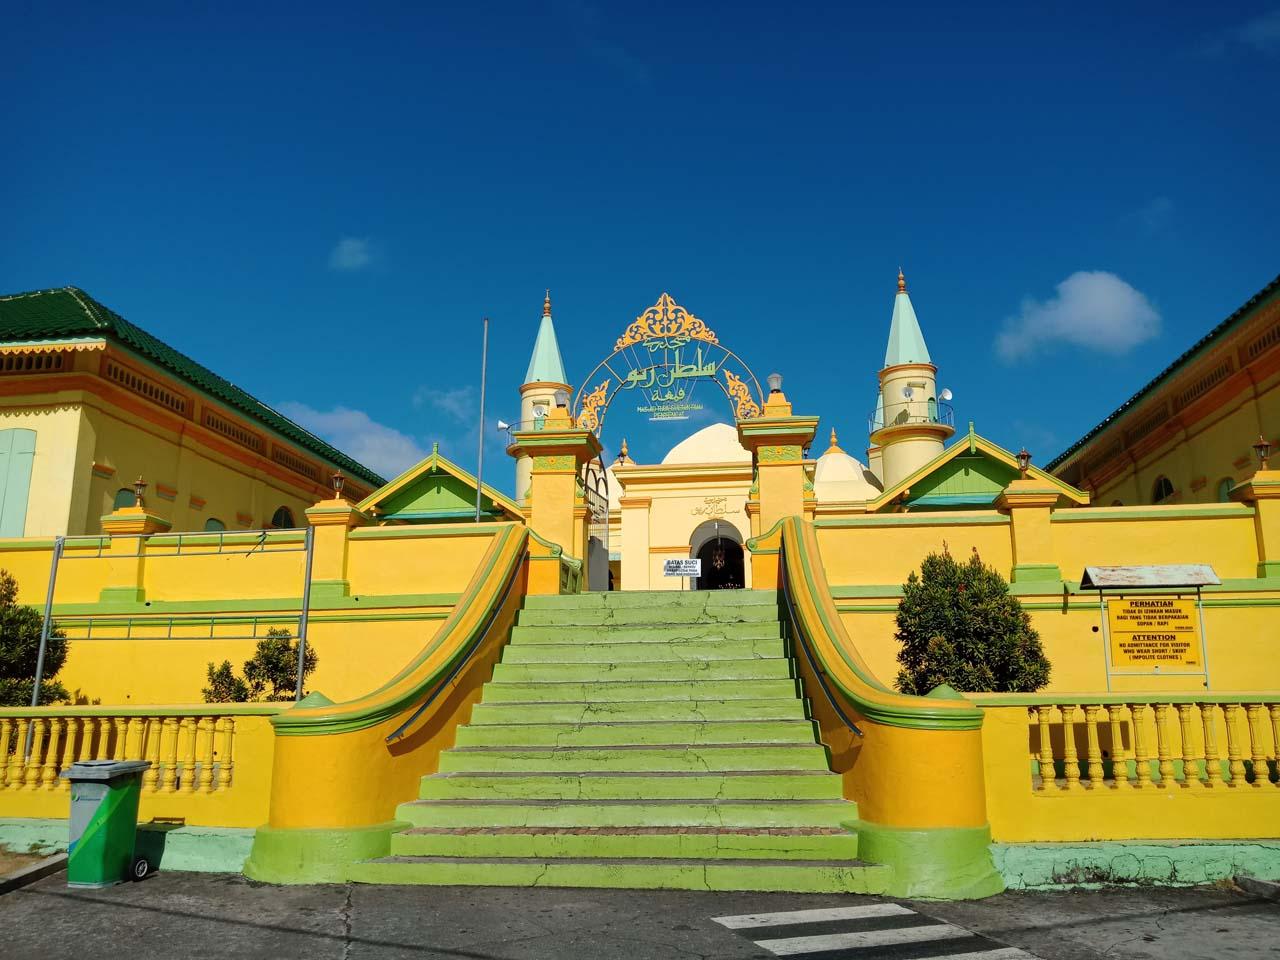 Masjid Raya Sultan Riau - Wisata Pulau Penyengat - Yopie Pangkey - 10